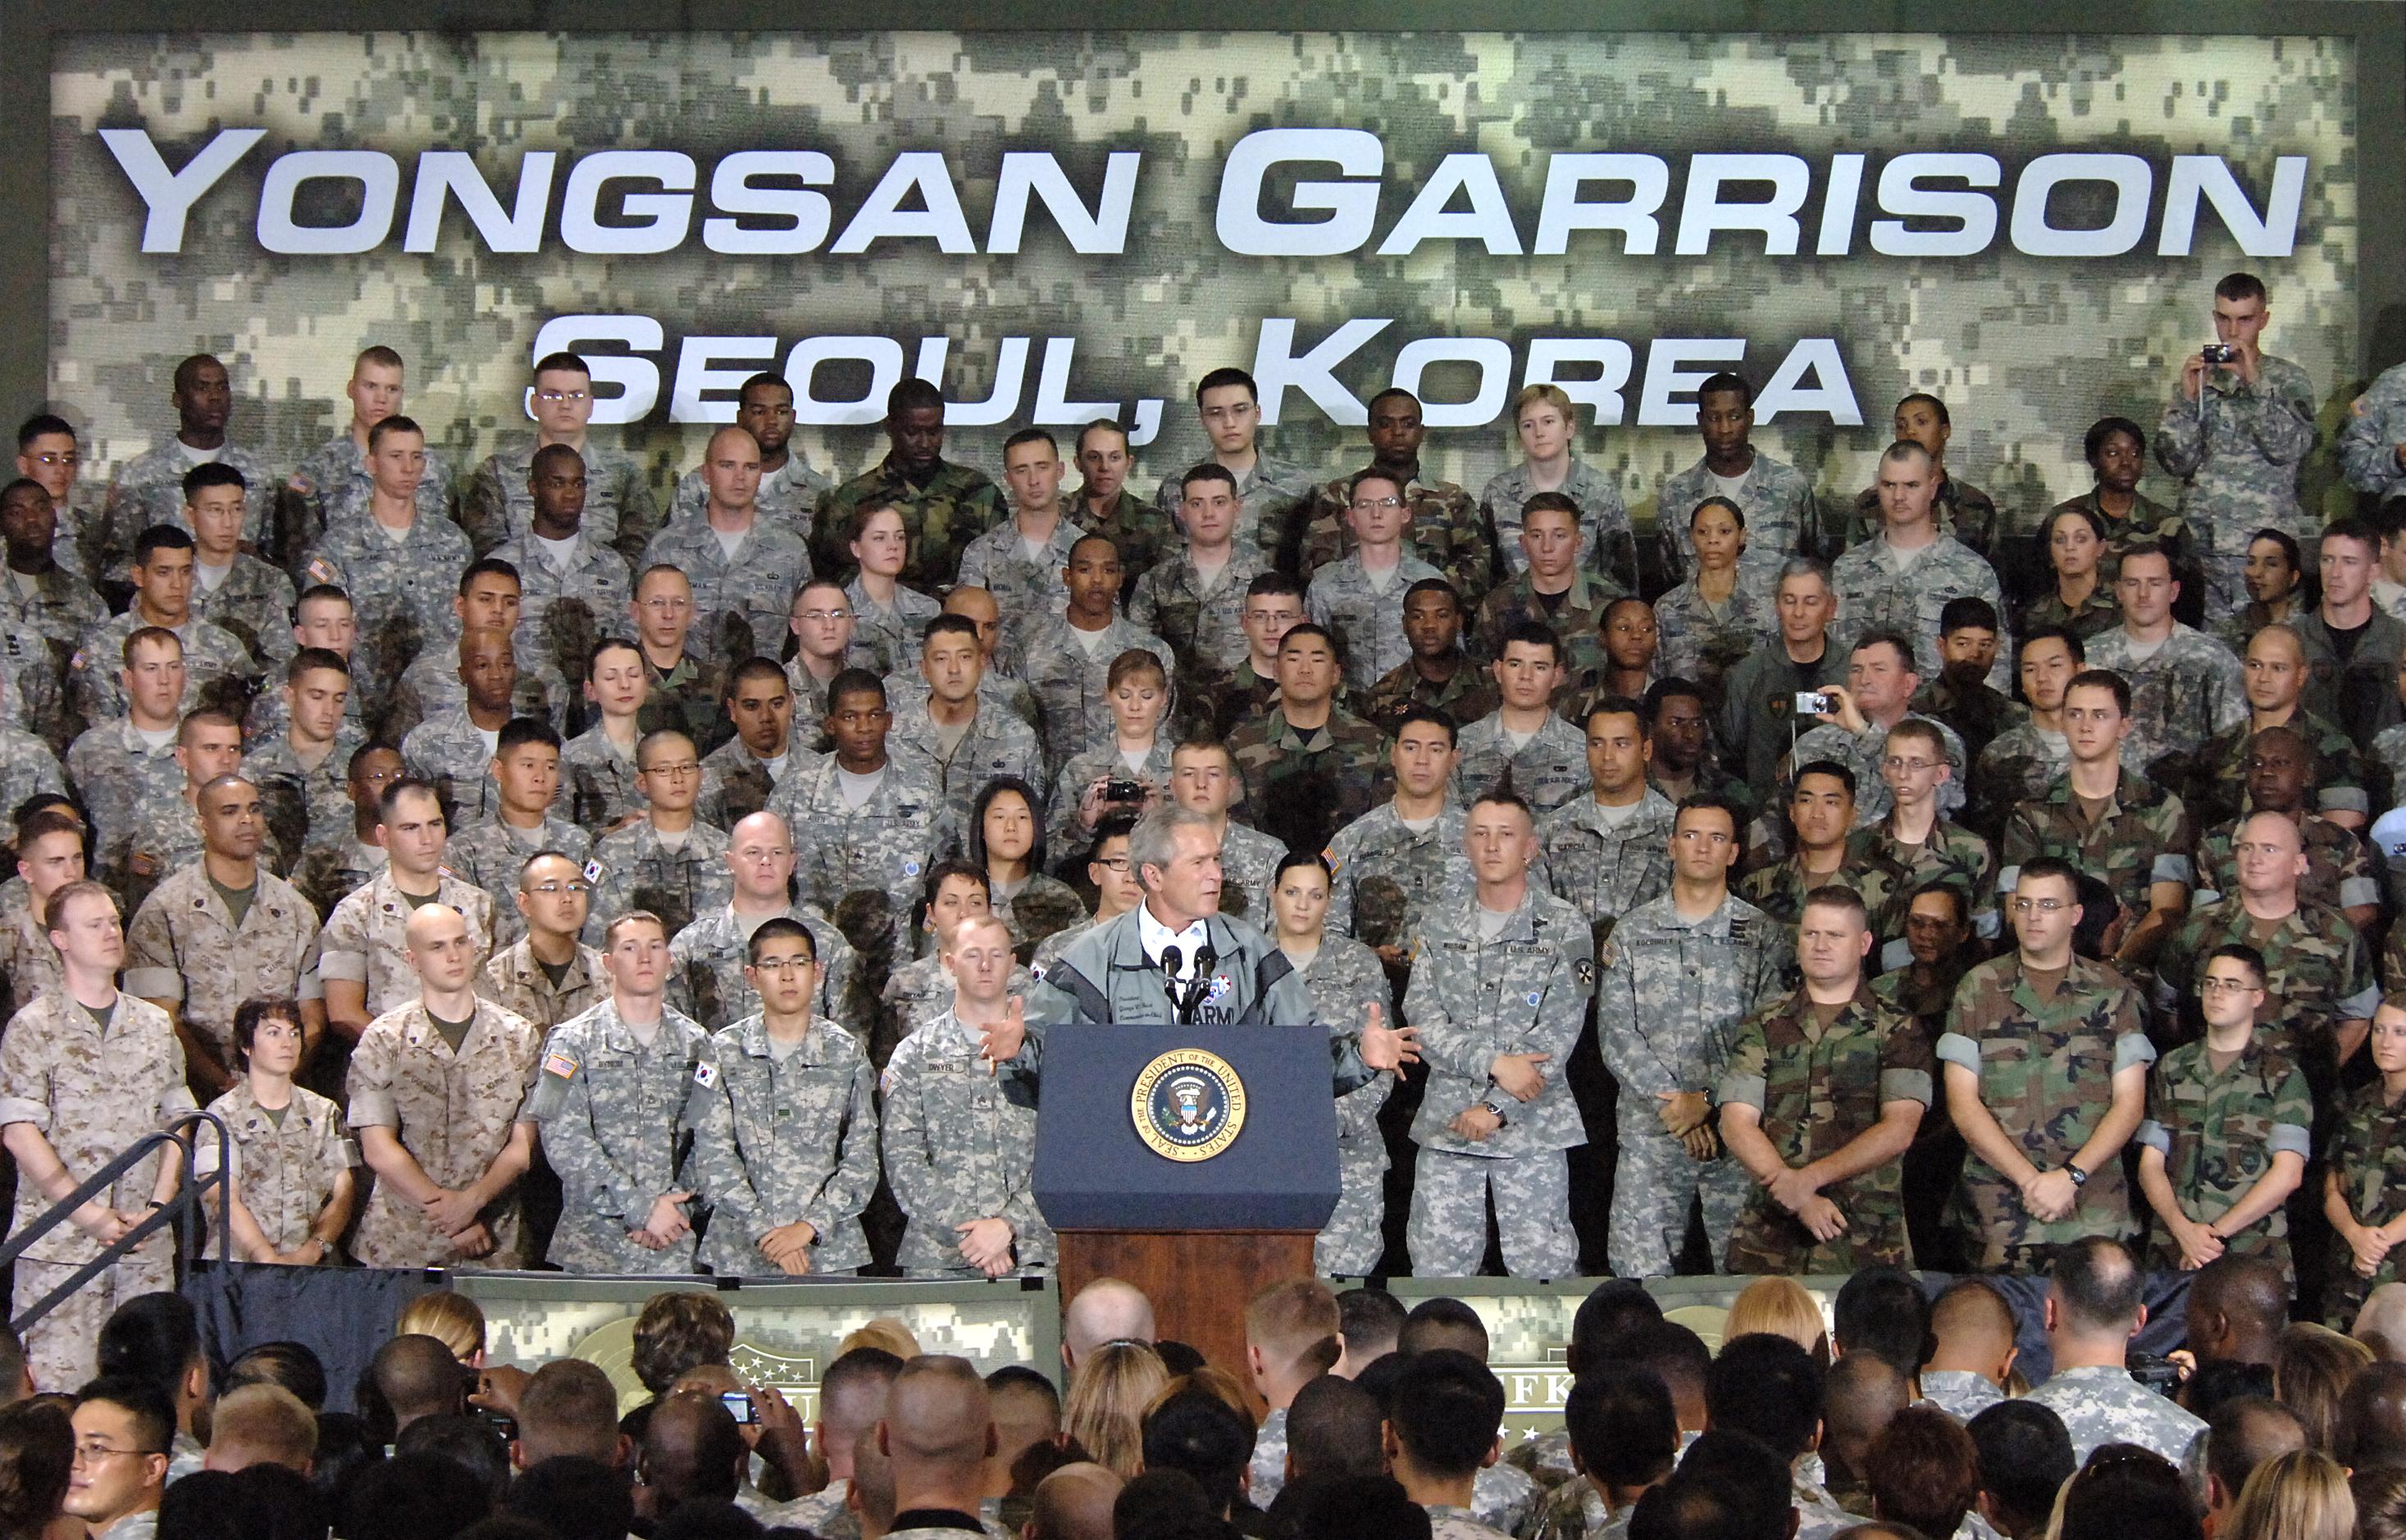 Yongsan Garrison Wikiwand